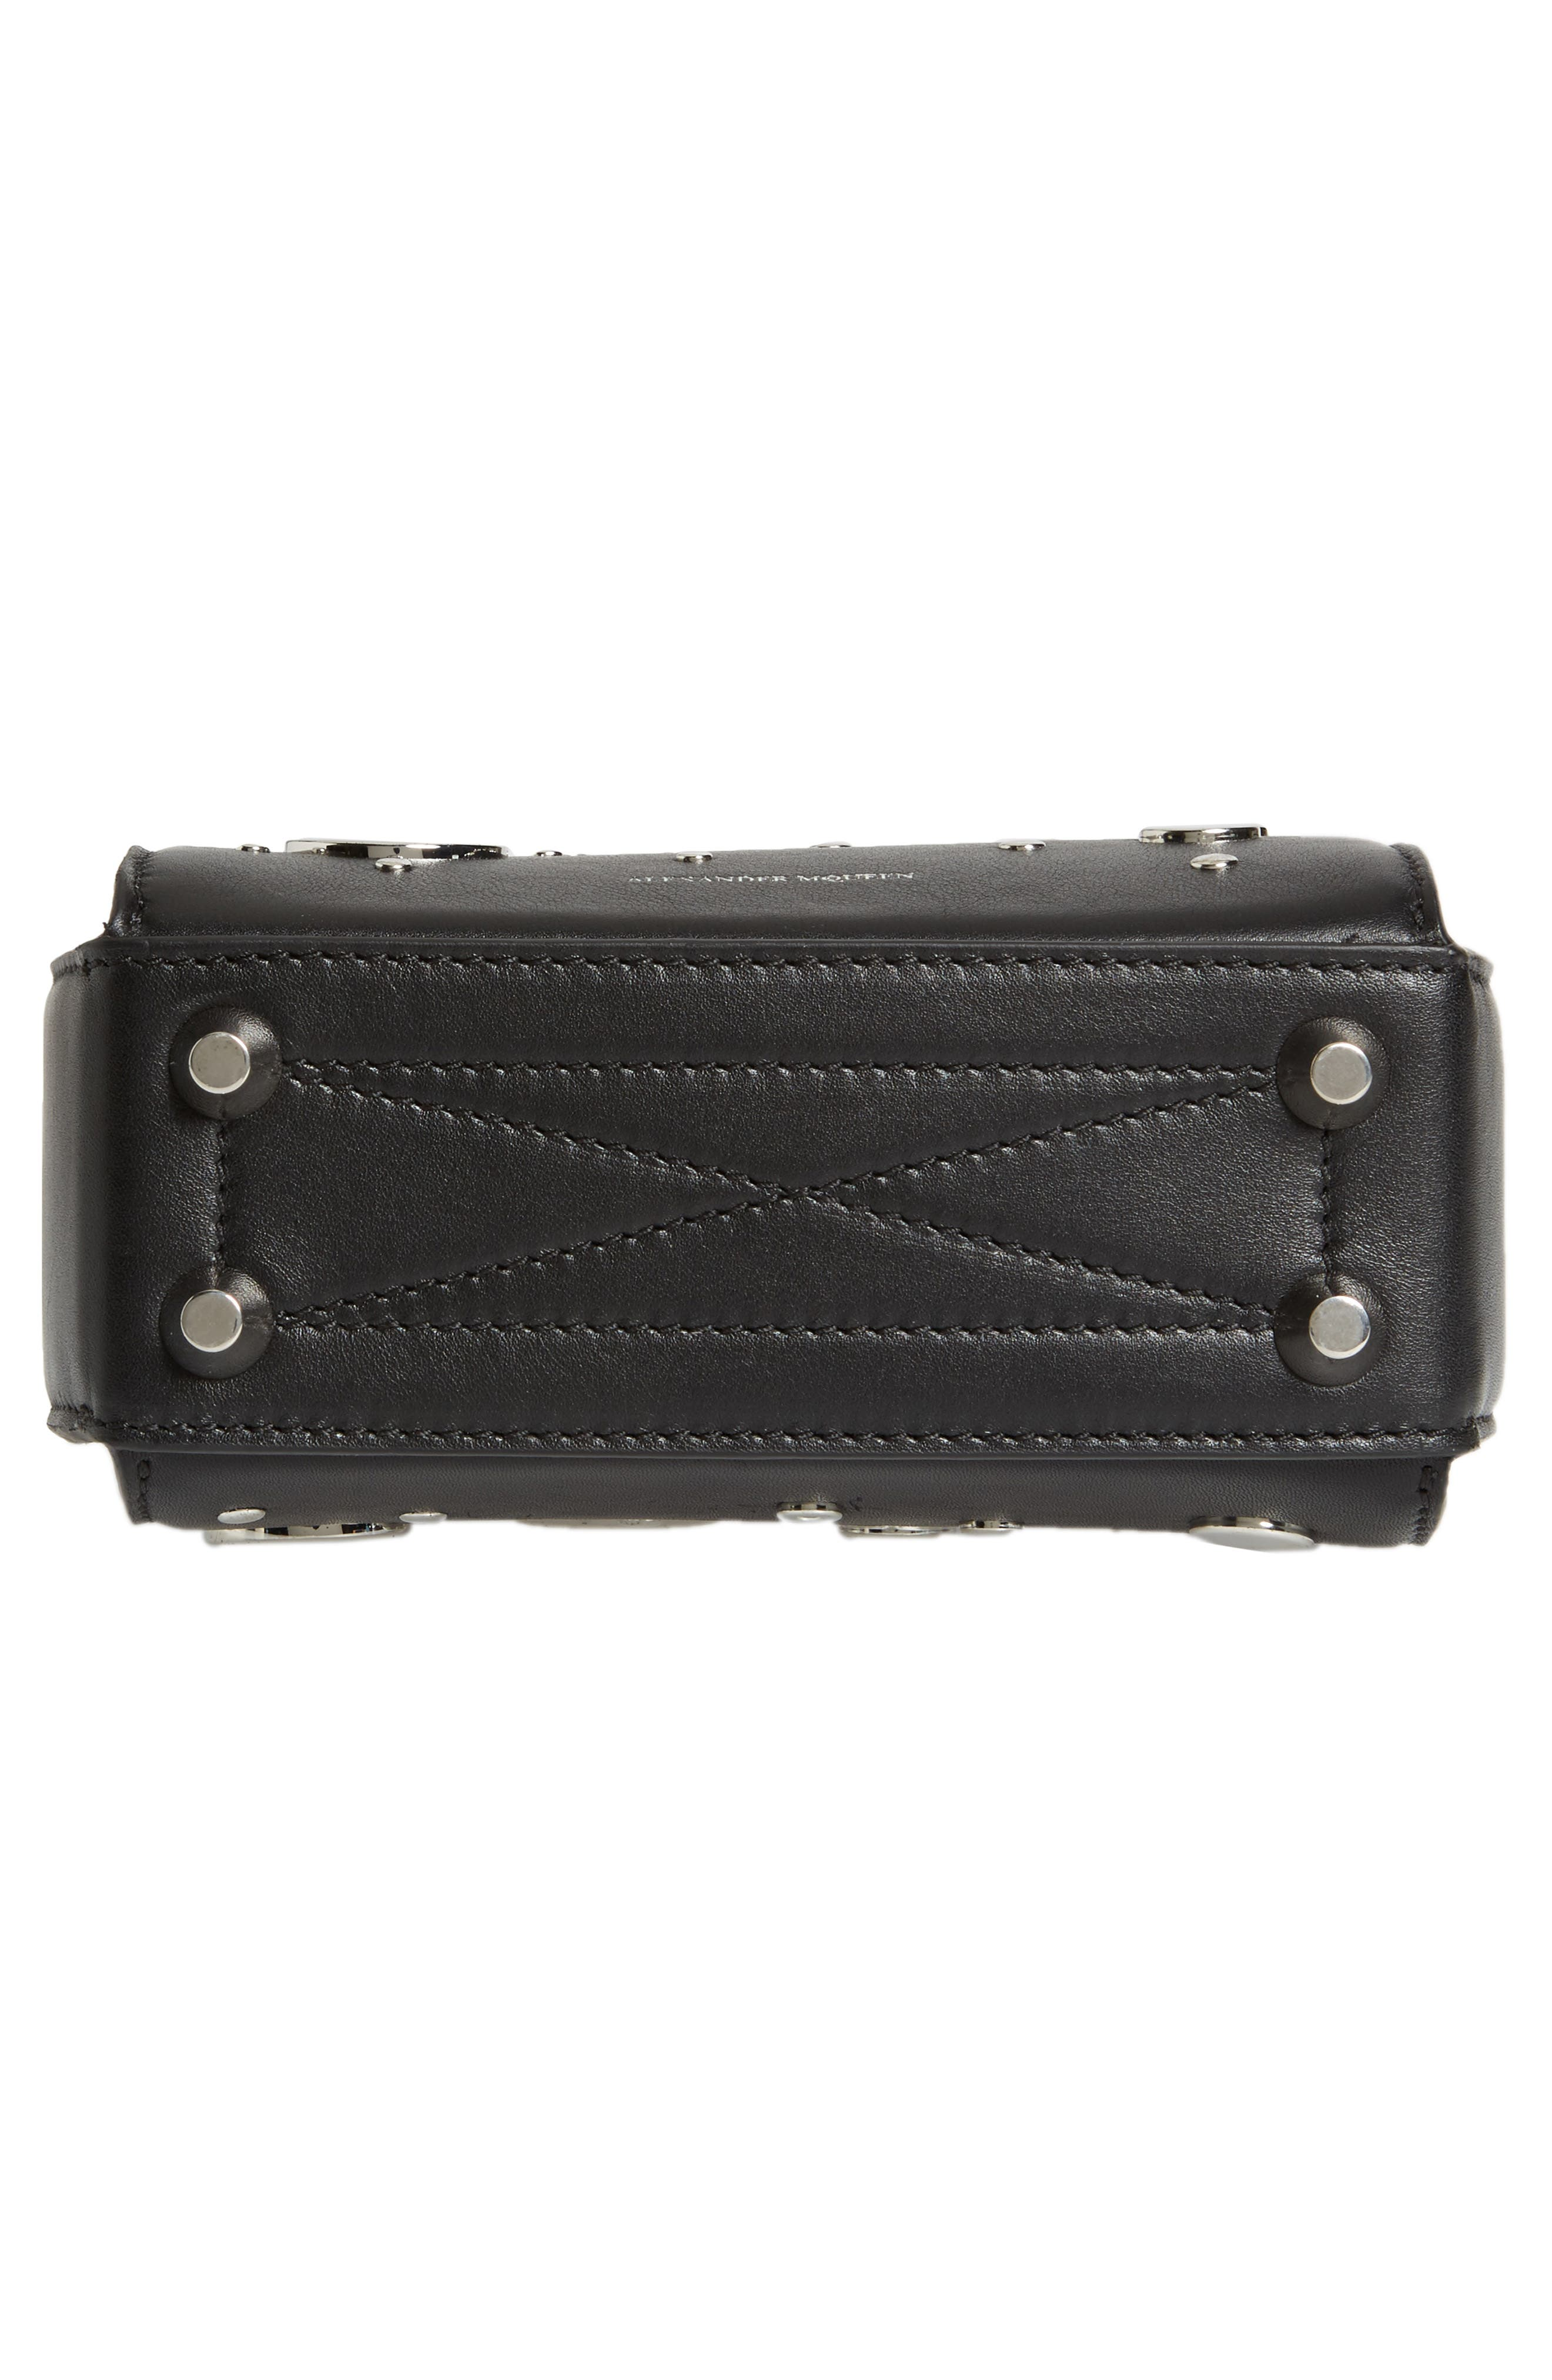 Box Bag 16 Matte Calfskin Bag,                             Alternate thumbnail 5, color,                             Black/ Red